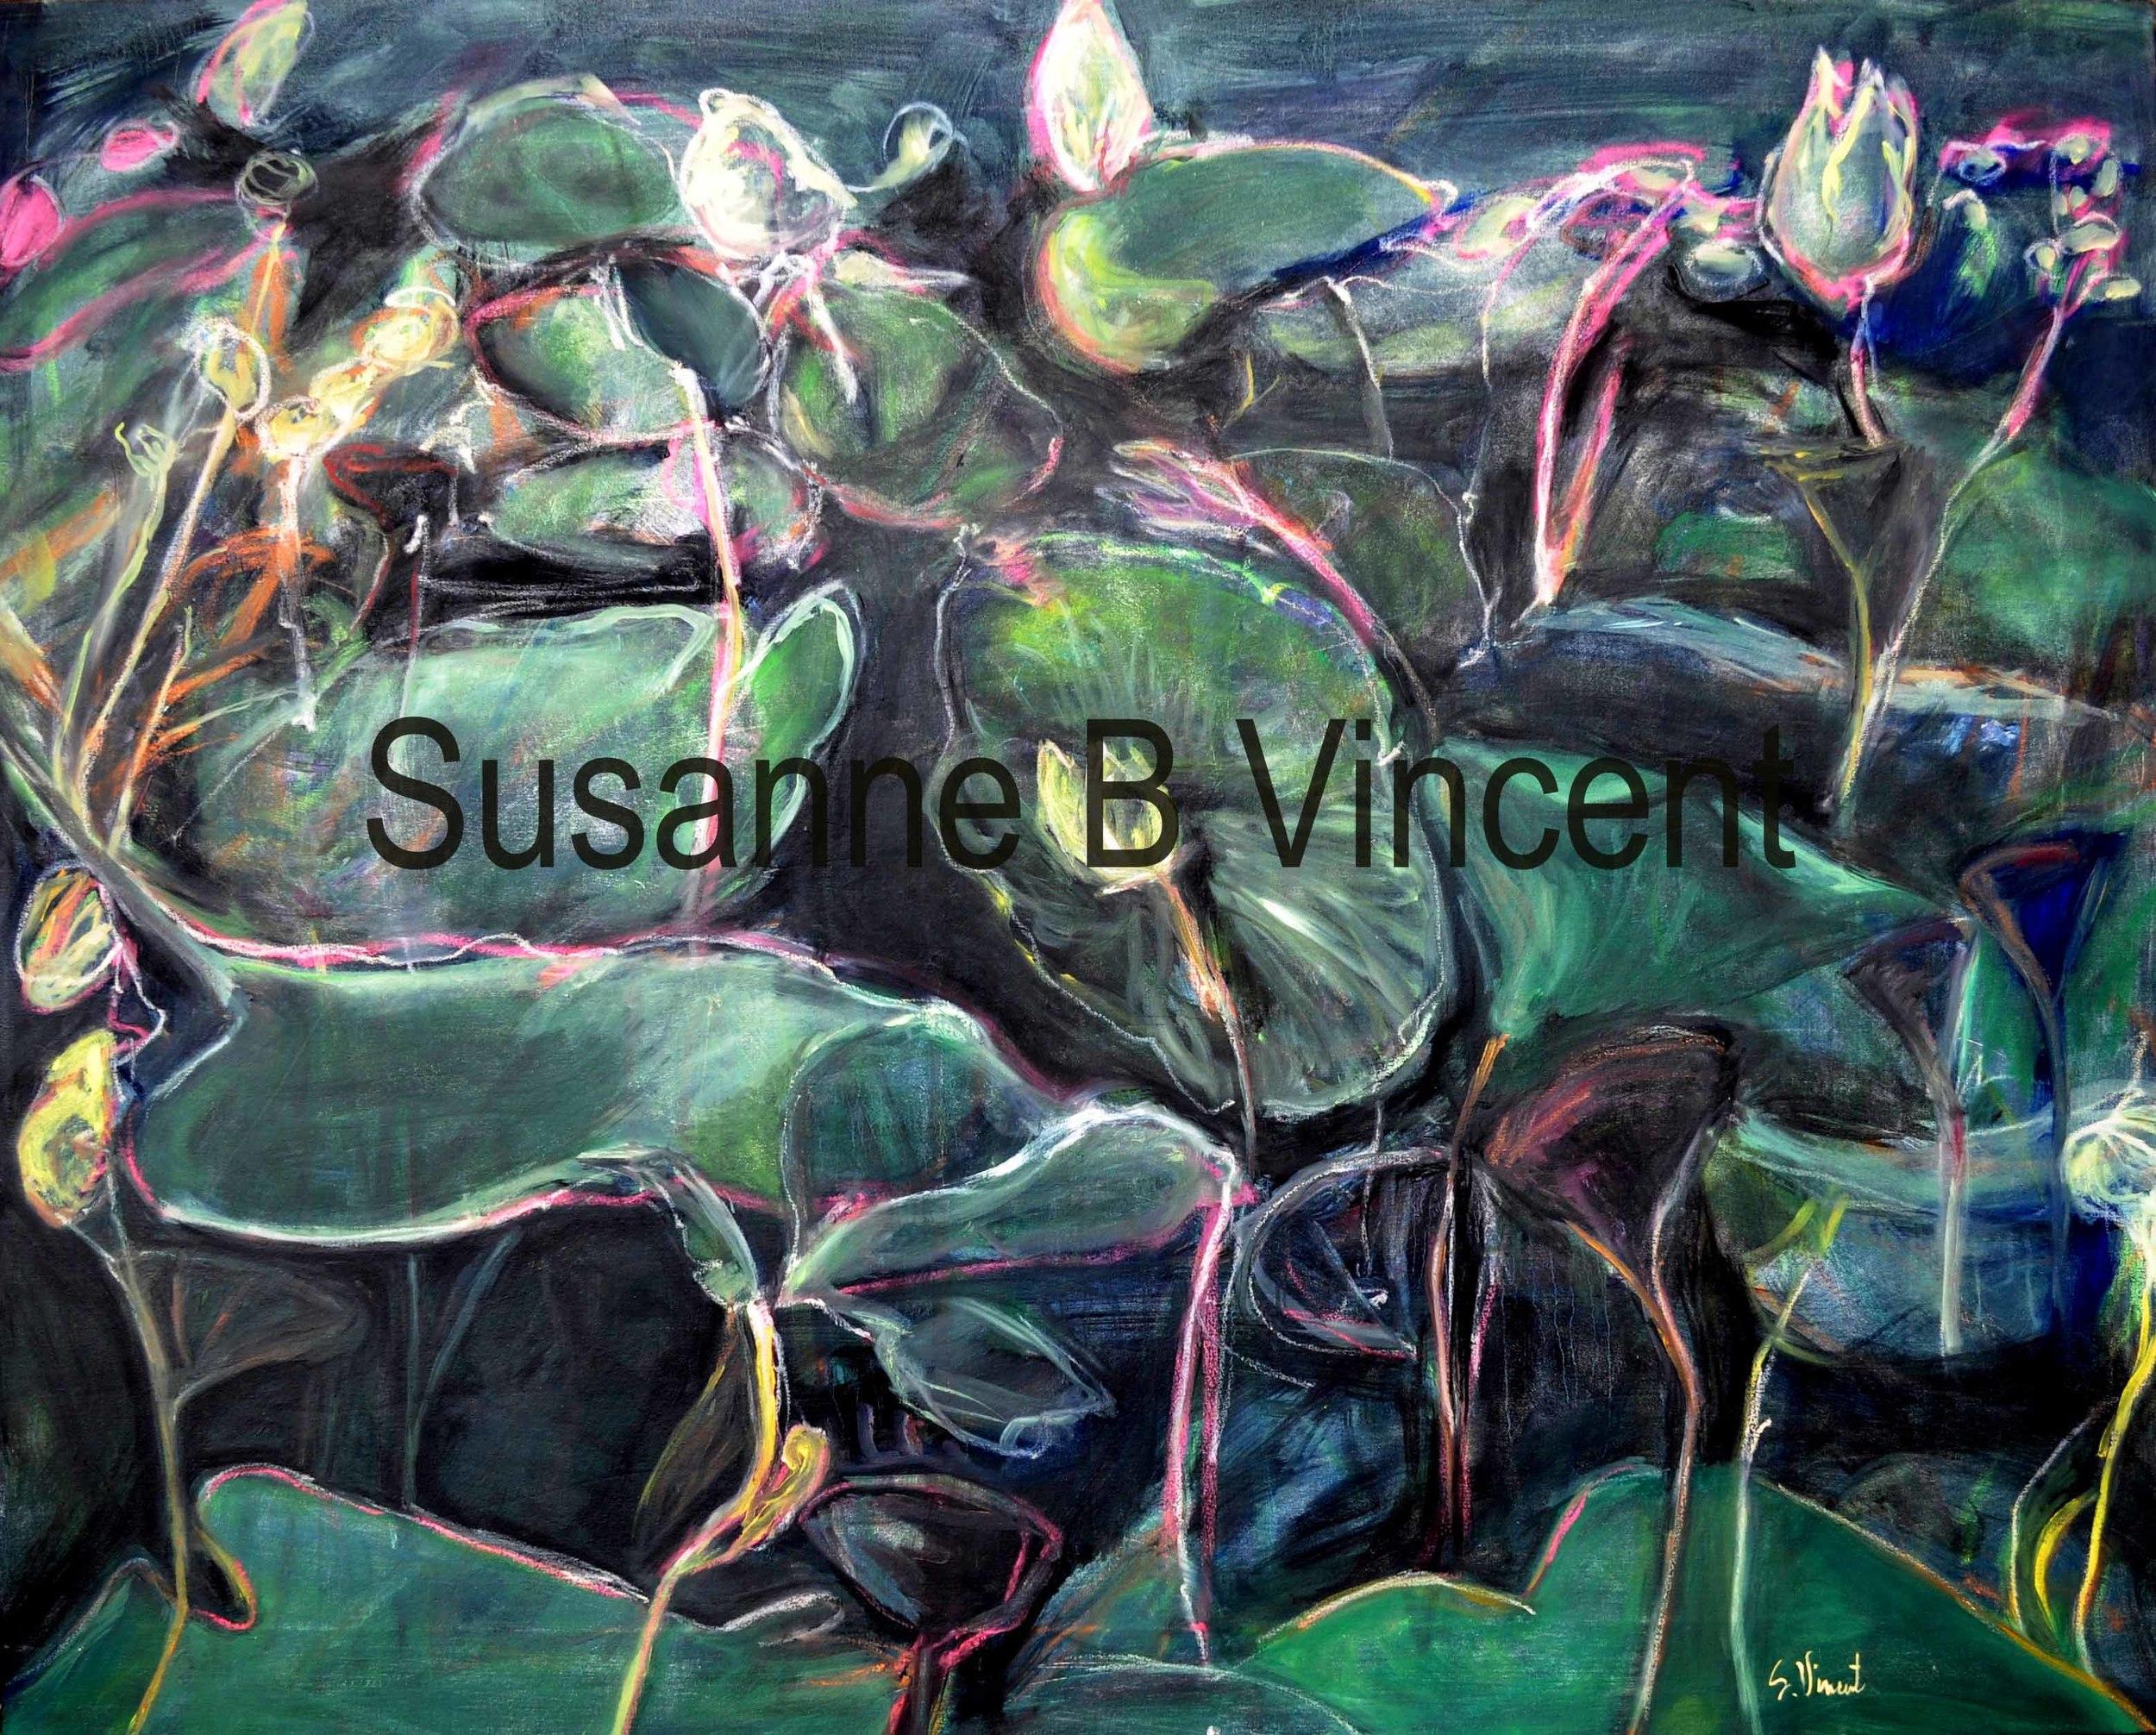 Water Lilies by Susanne Vincent